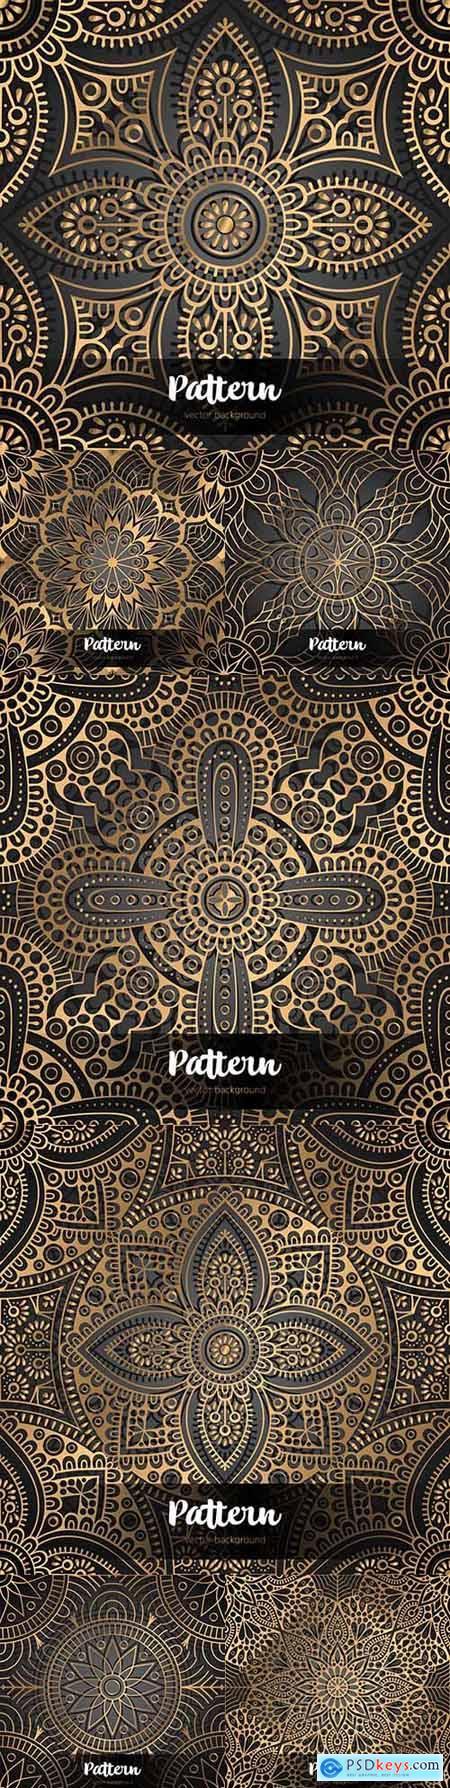 Elegance luxury Victorian motif traditional design pattern